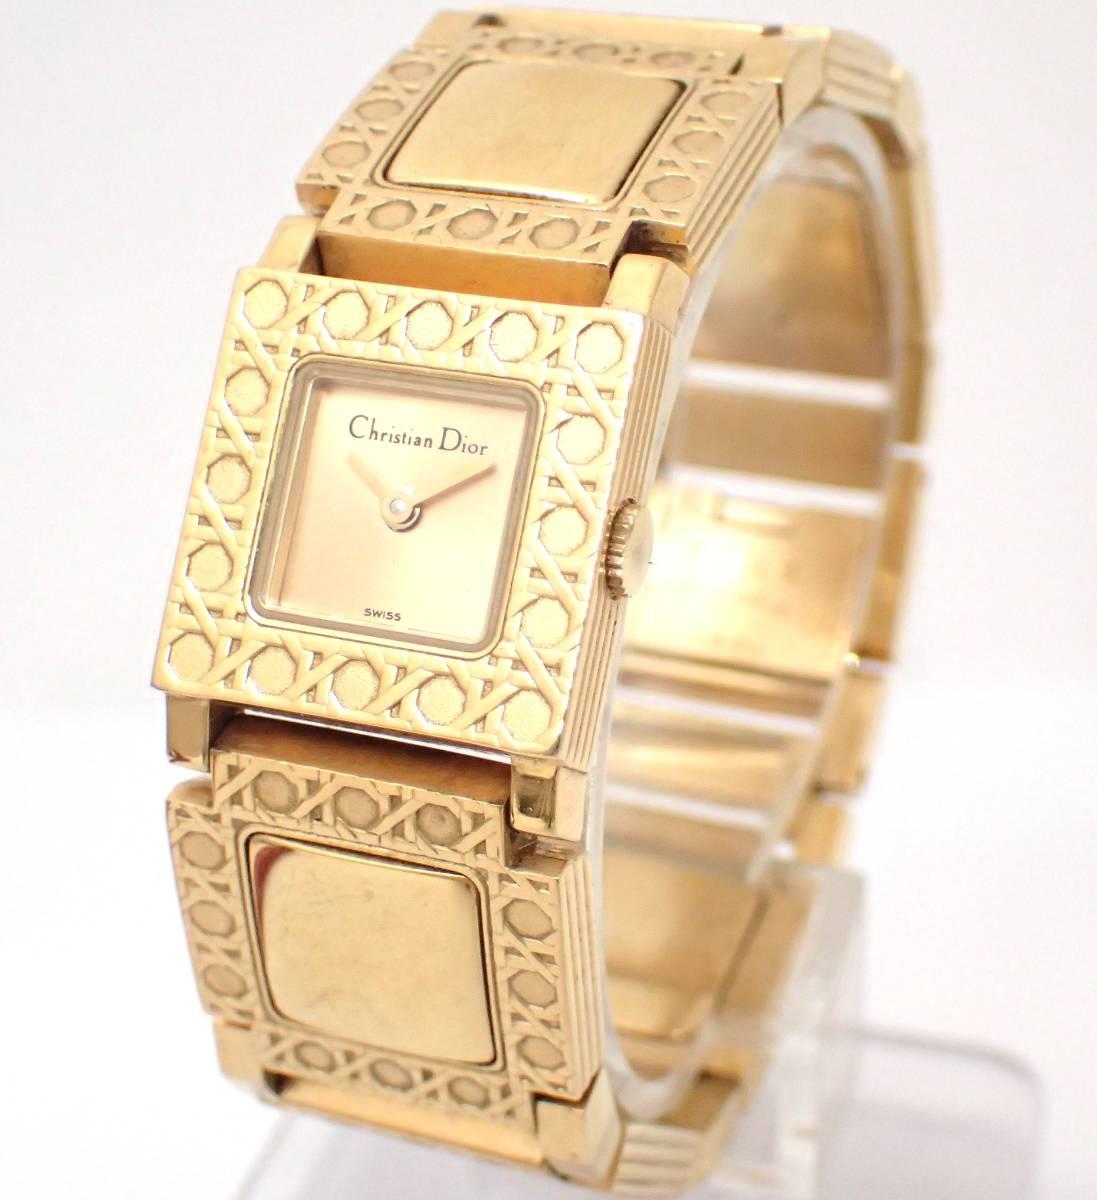 Christian Dior/ディオール/D60-150/ラ・パリジェンヌ/レディース腕時計/ジャンク[T]